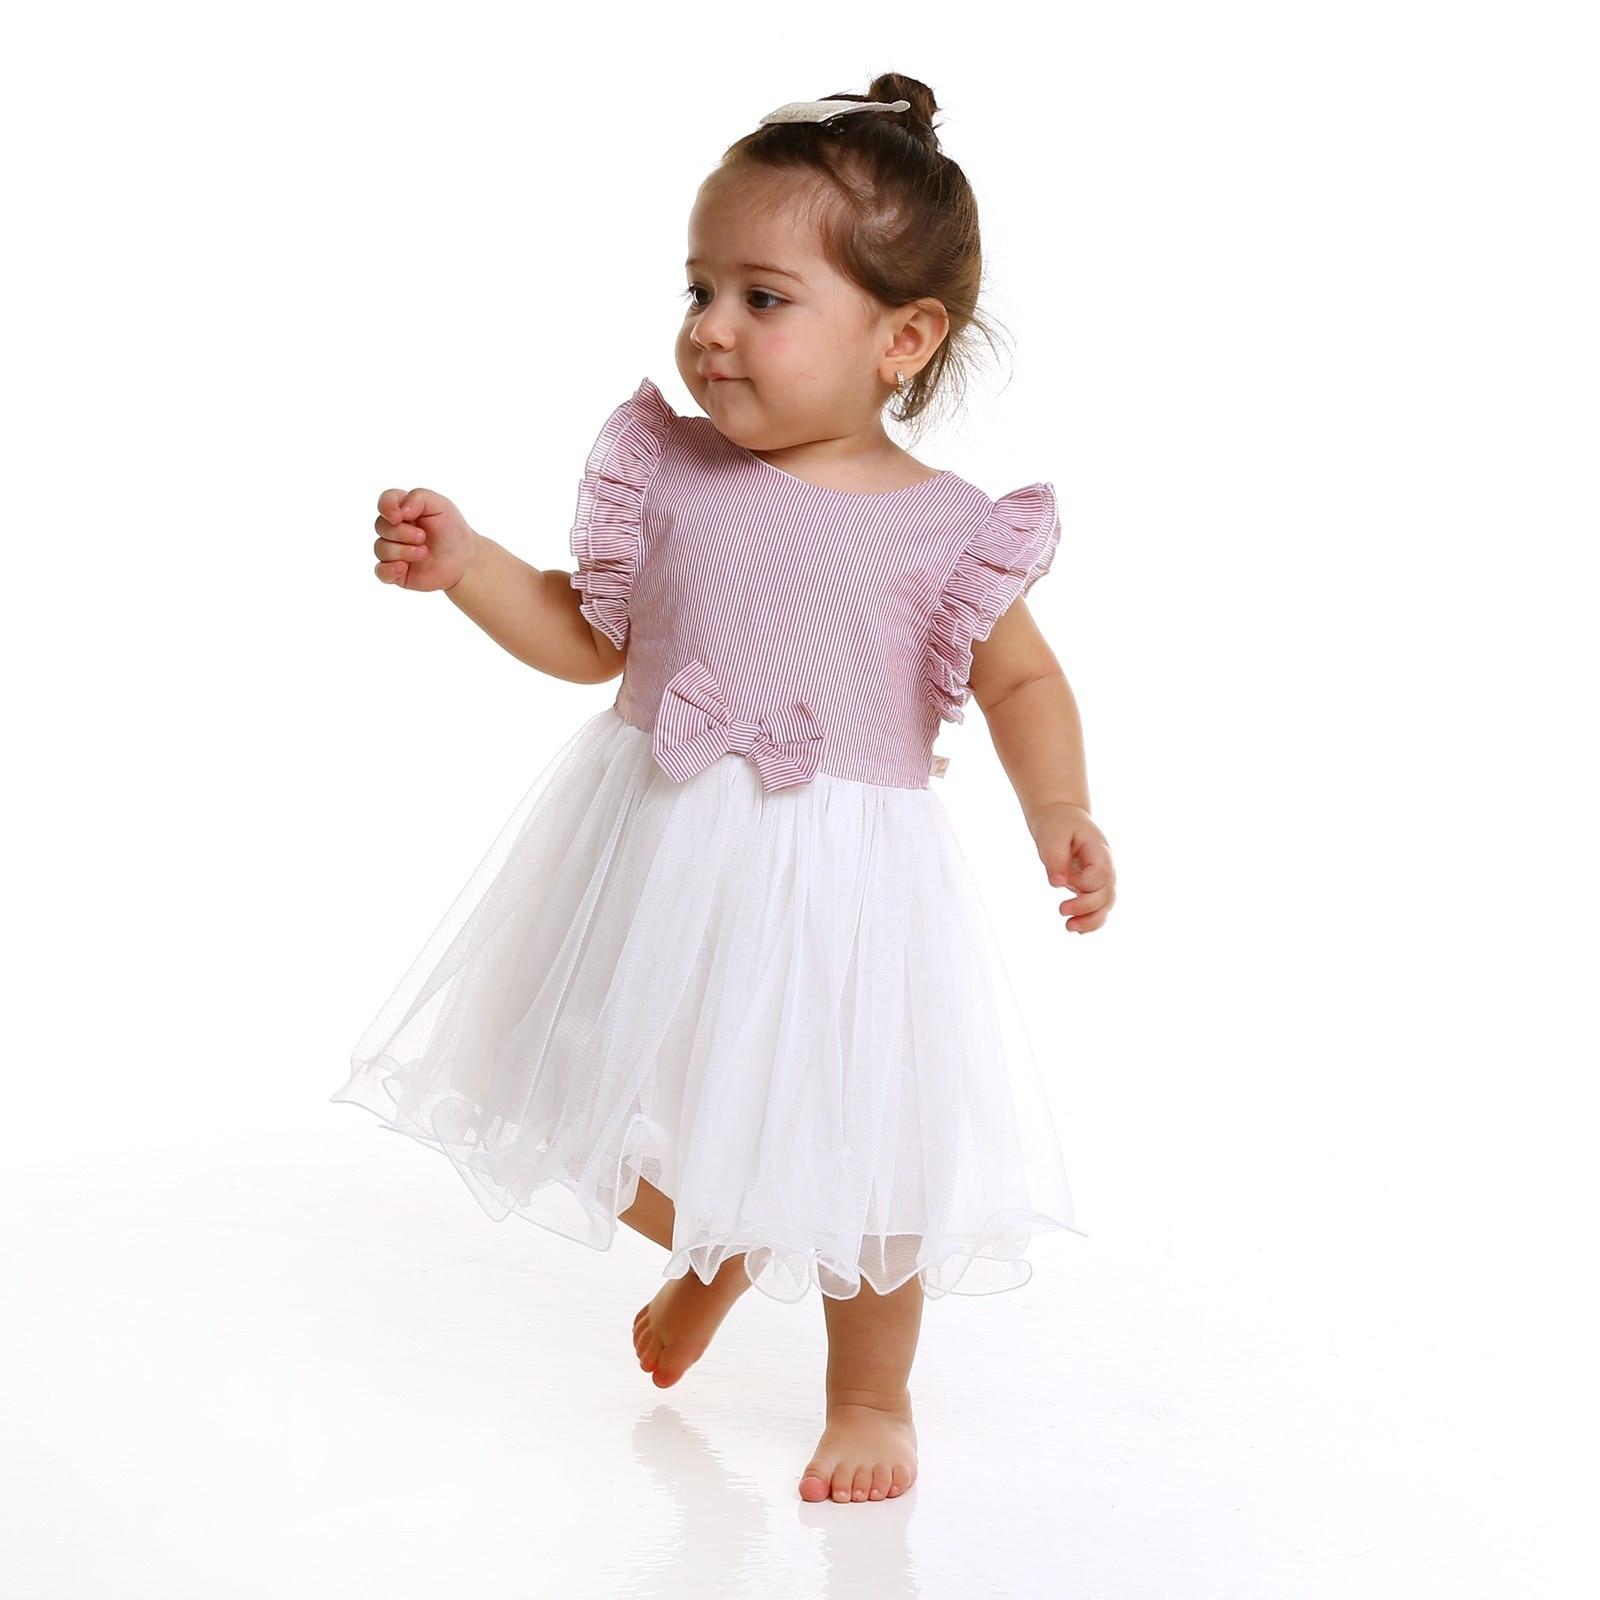 Ebebek BabyZ Baby Girl Texture Bow Detailed Panty Dress